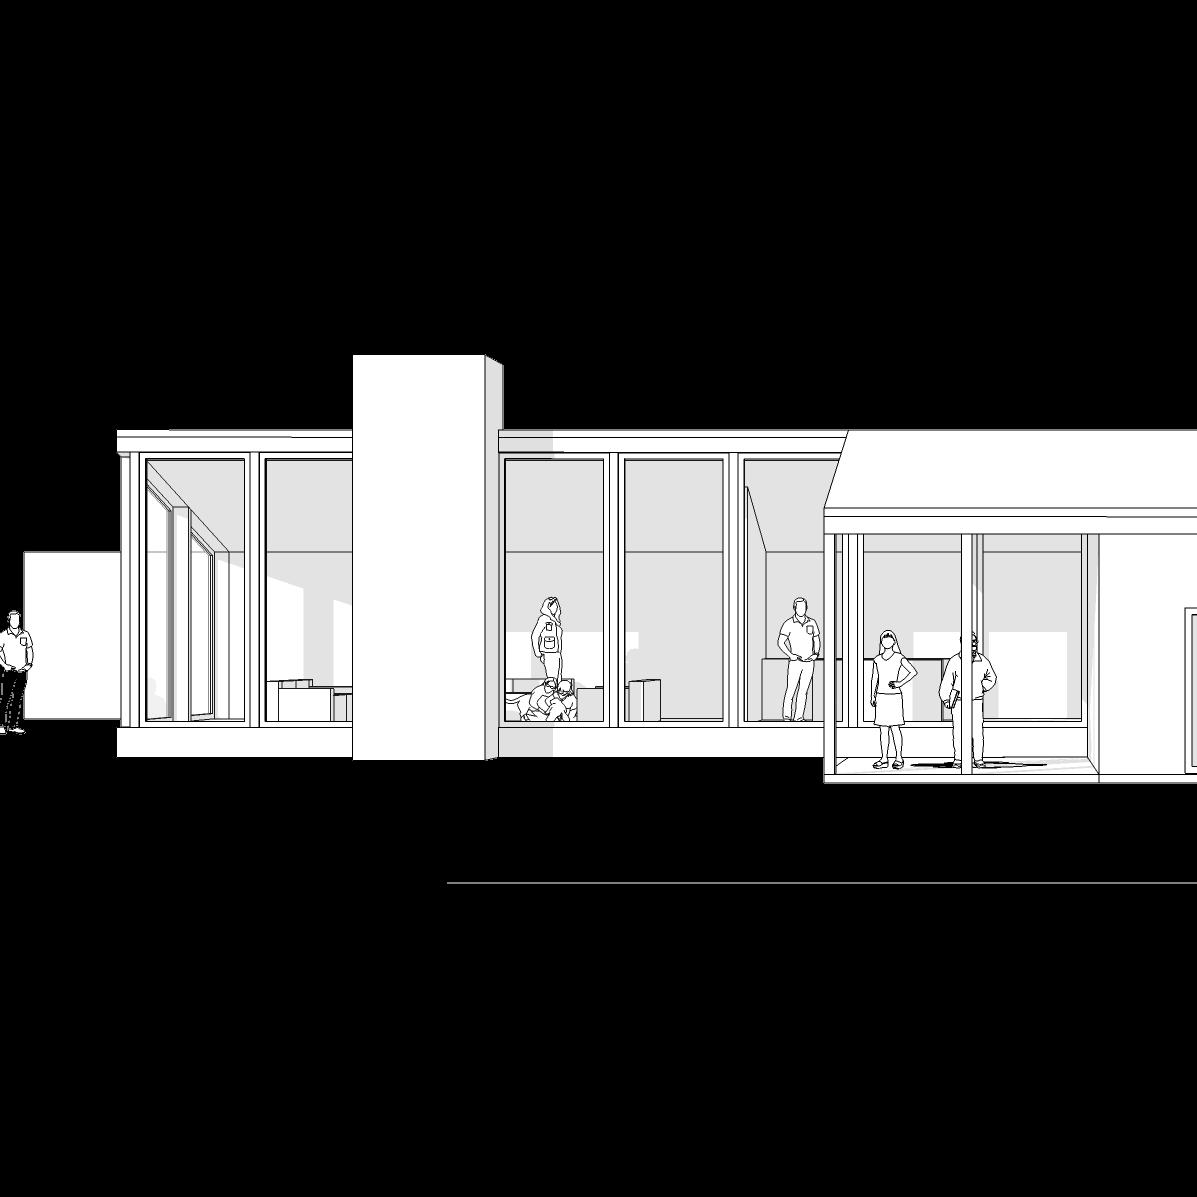 Casa Nitel pabellon